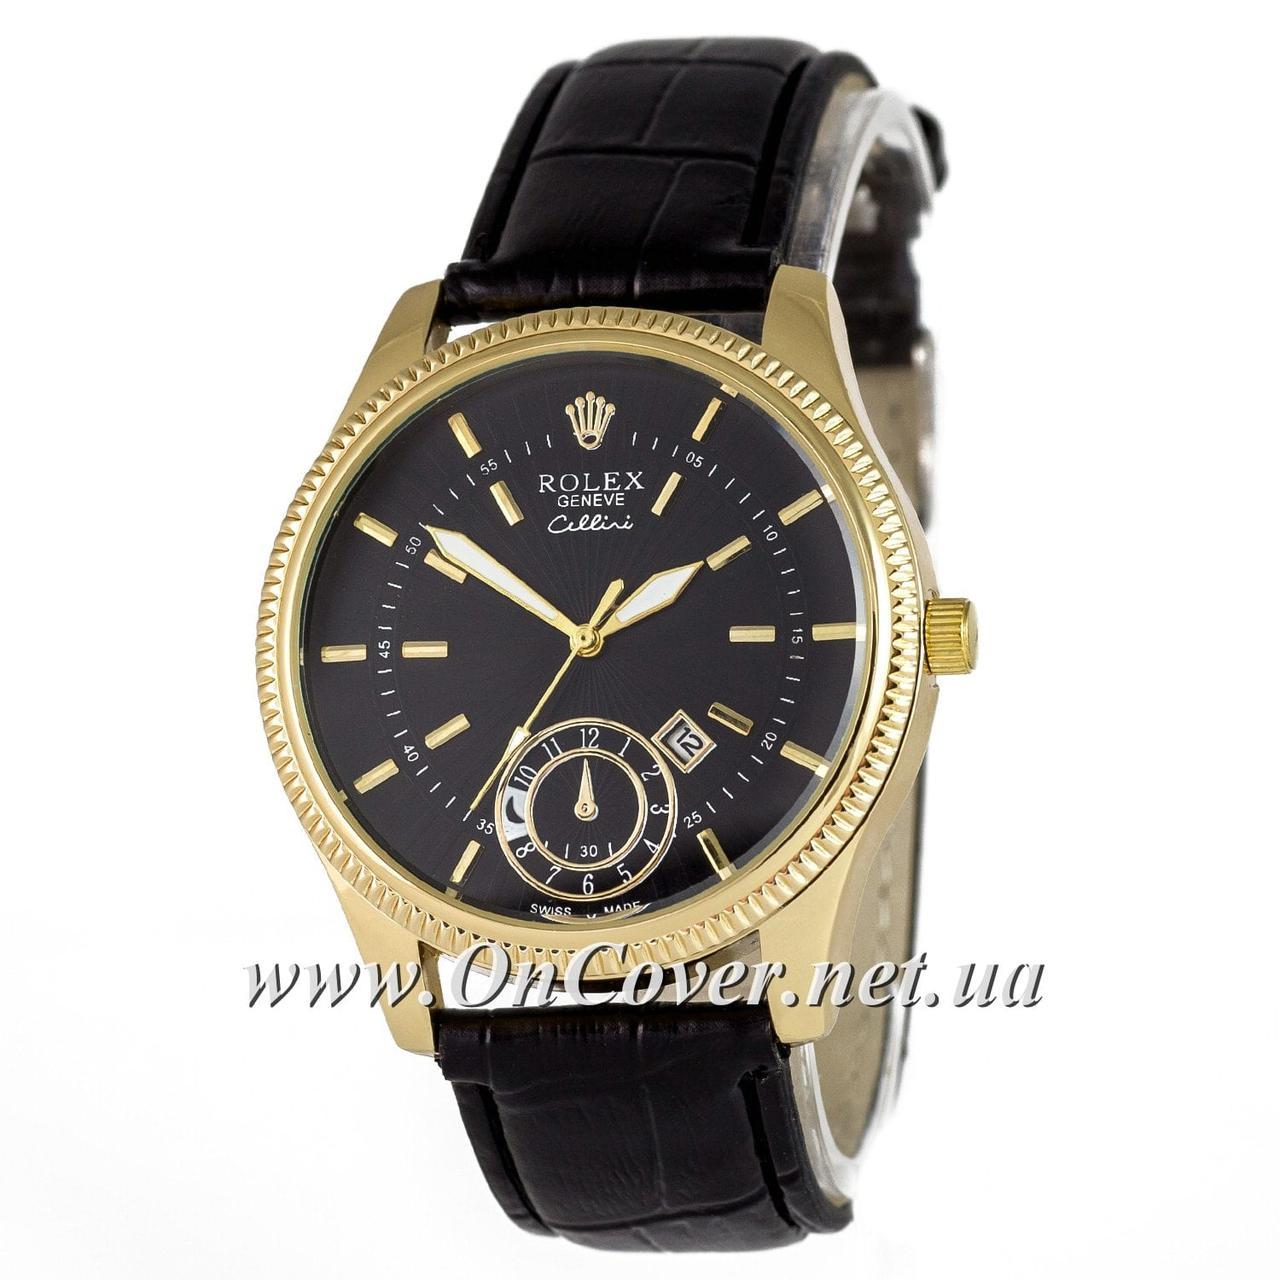 Наручные кварцевые часы Rolex Geneve Cellini Gold-Black 095625a33931d